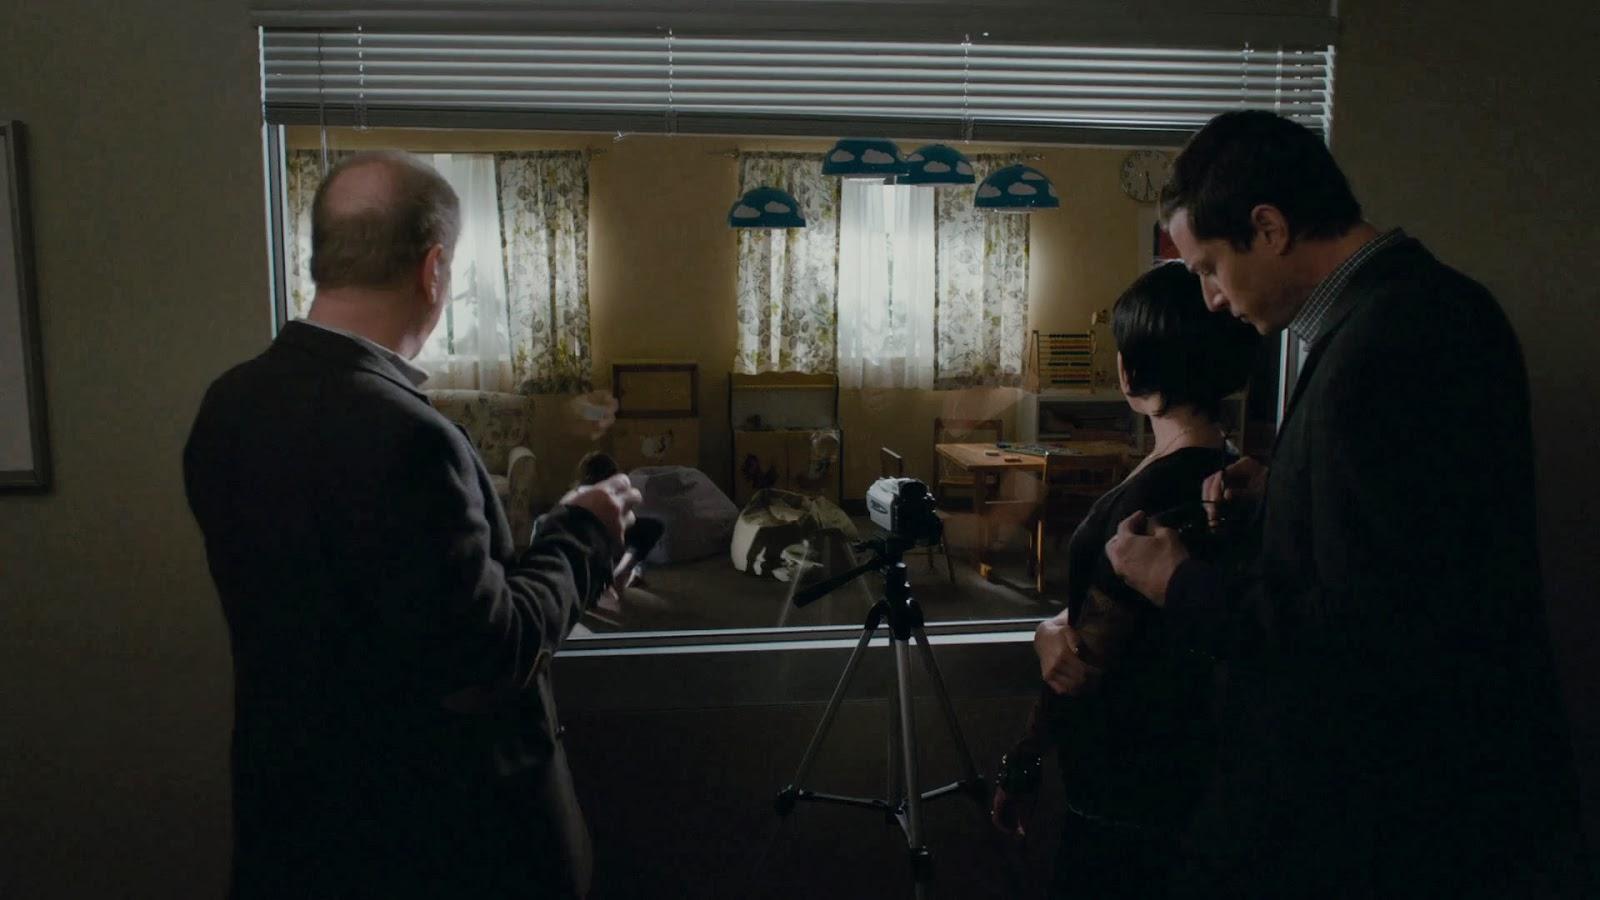 Scary Movie 5 1080p Tpb Titan Octane Watch 9322sl04 -> Pelismegahd